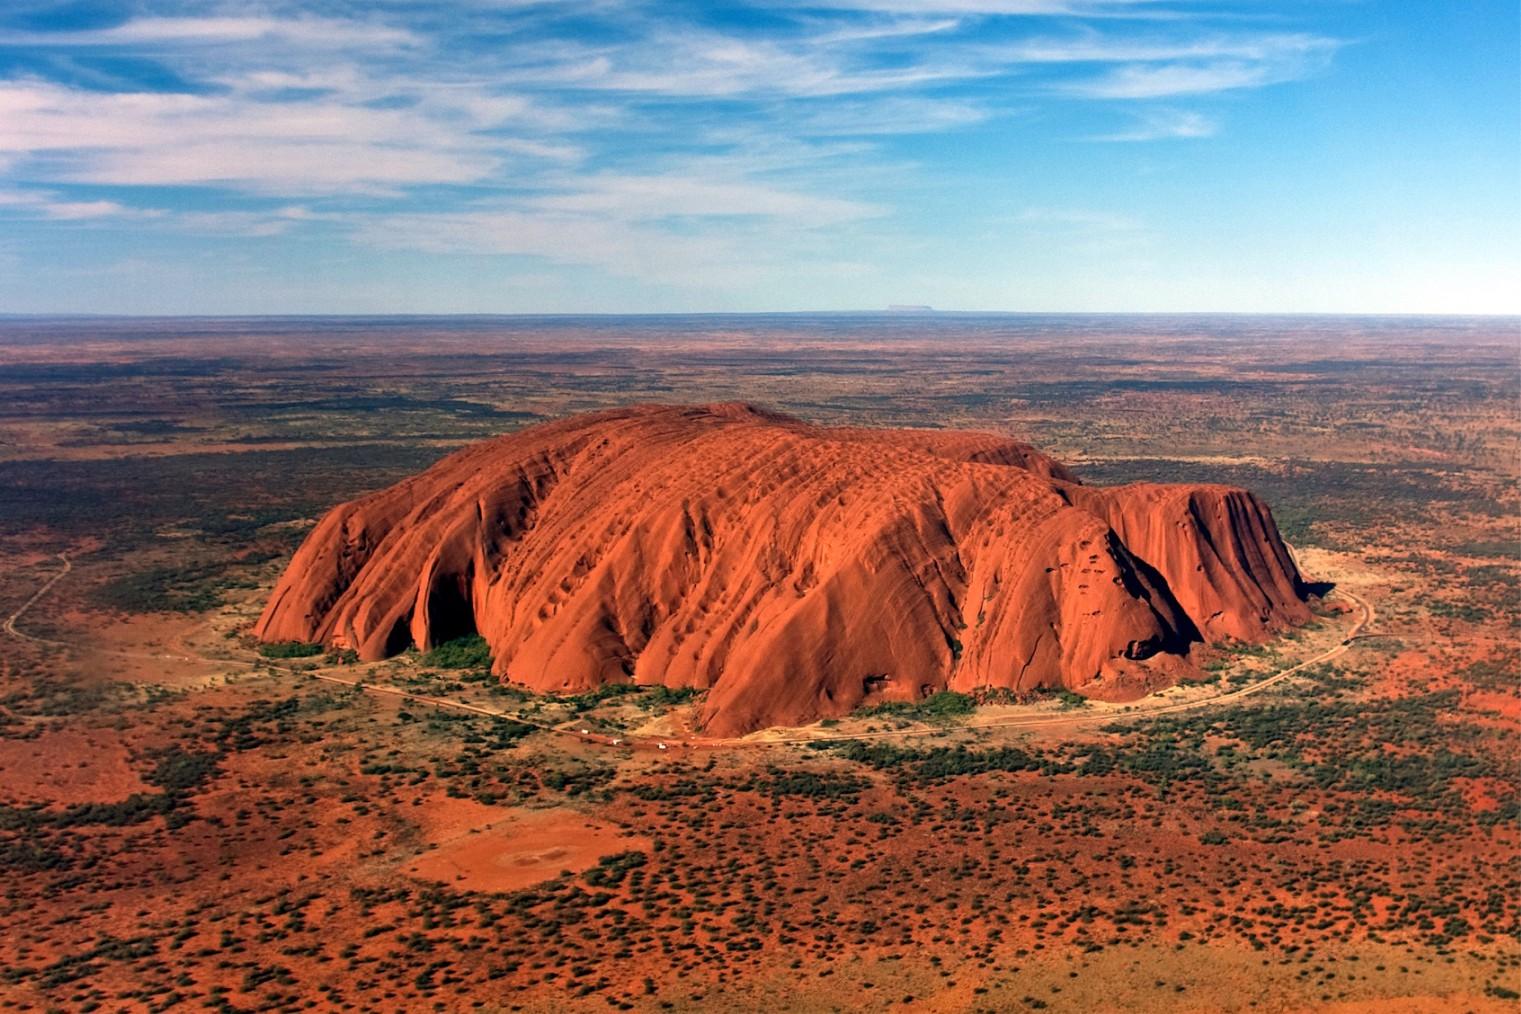 Ayers Rock, Uluru. Travel. Скала Улуру